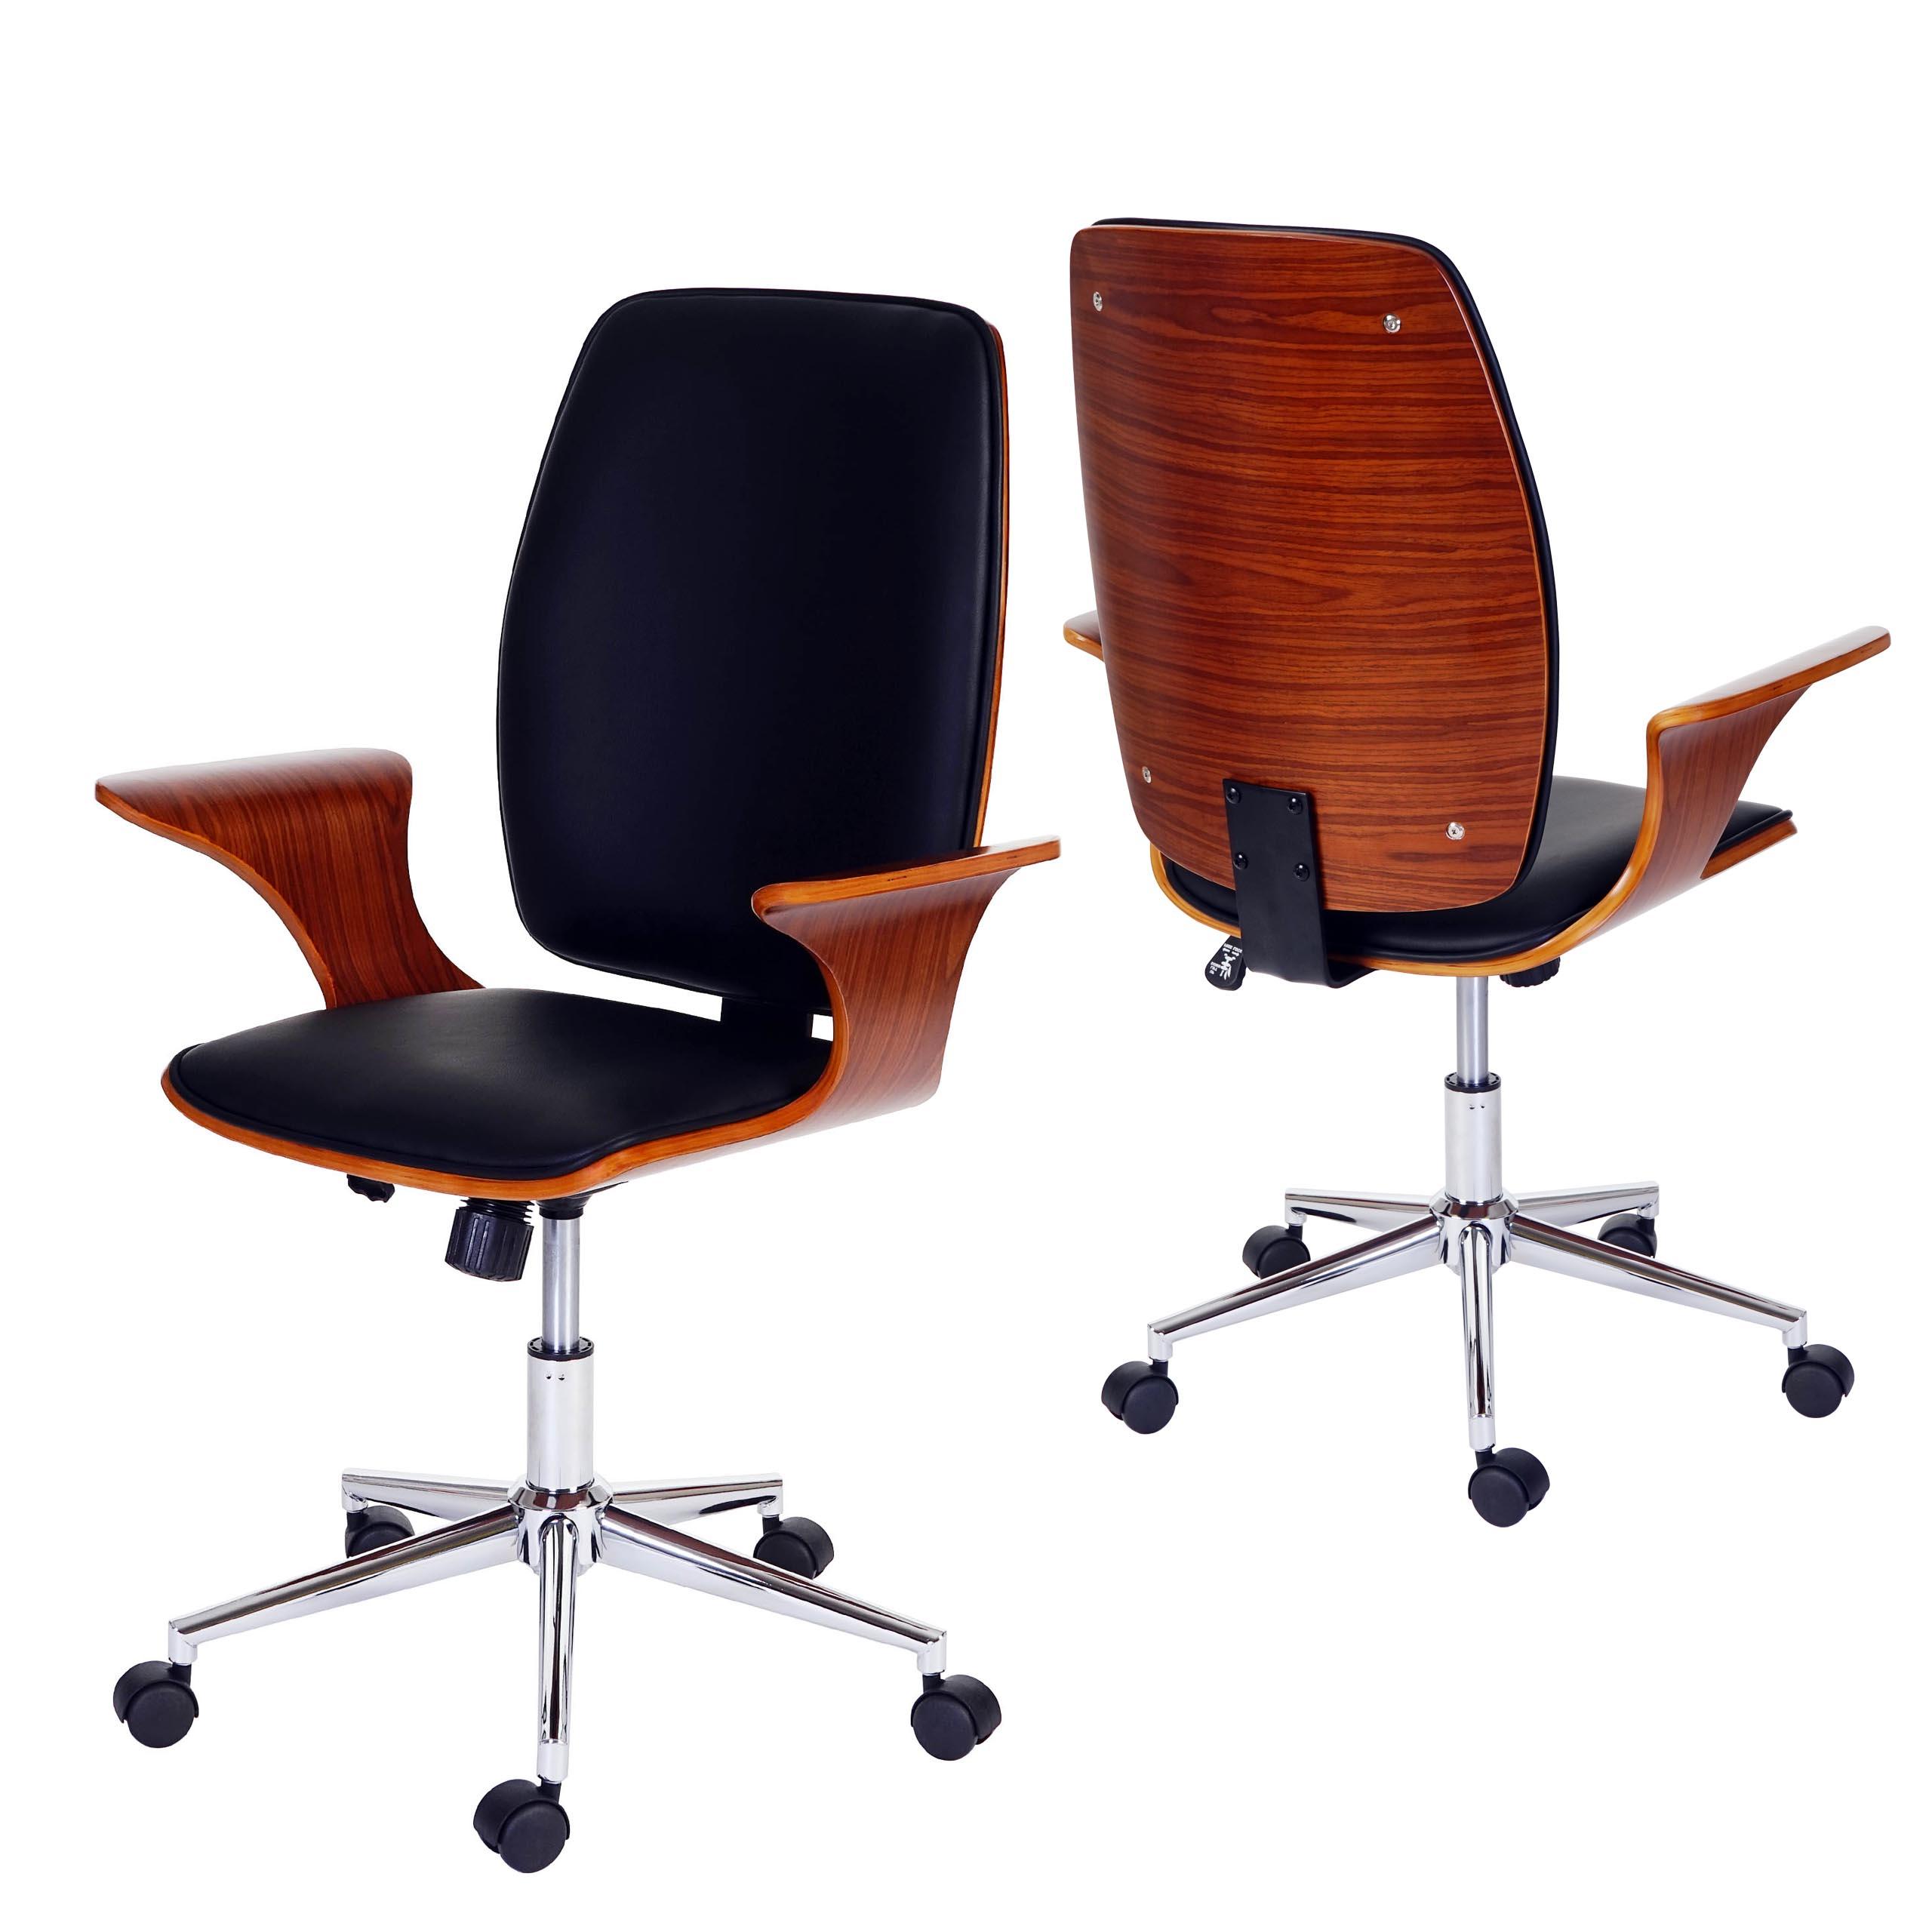 brostuhl kaufen bezug fr brostuhl bezug einzigsitz cm. Black Bedroom Furniture Sets. Home Design Ideas